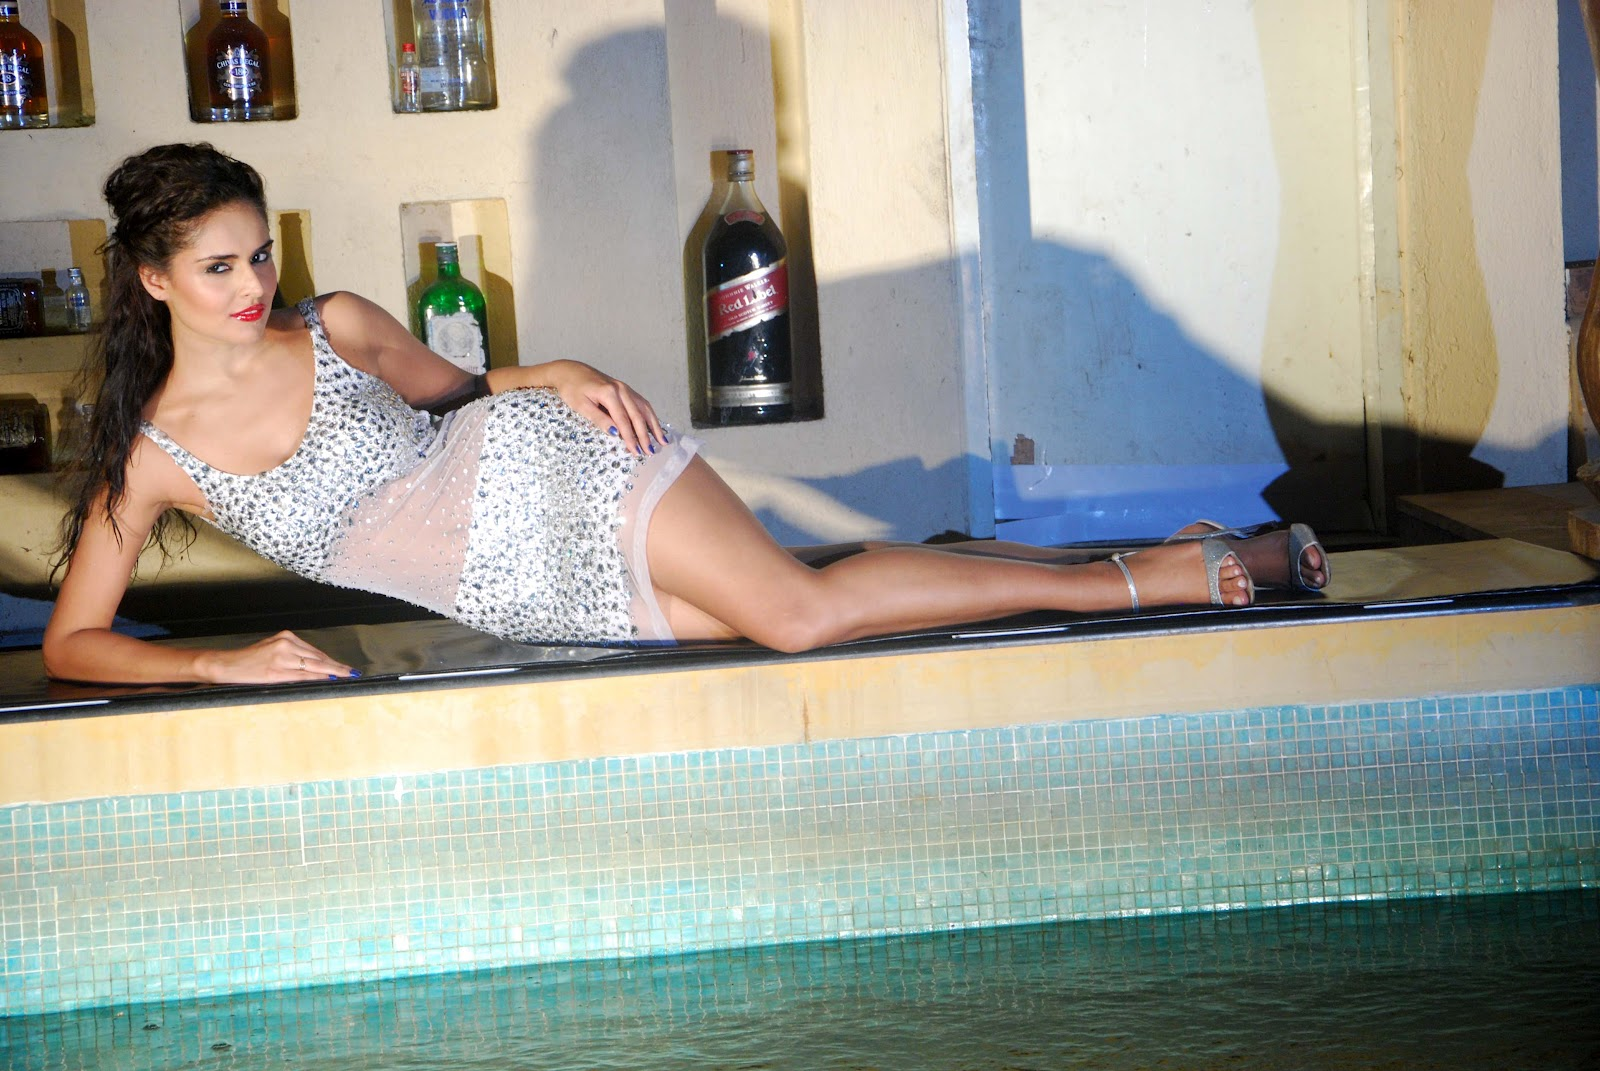 Feet Nathalia Kaur nudes (59 foto and video), Sexy, Hot, Boobs, cleavage 2019